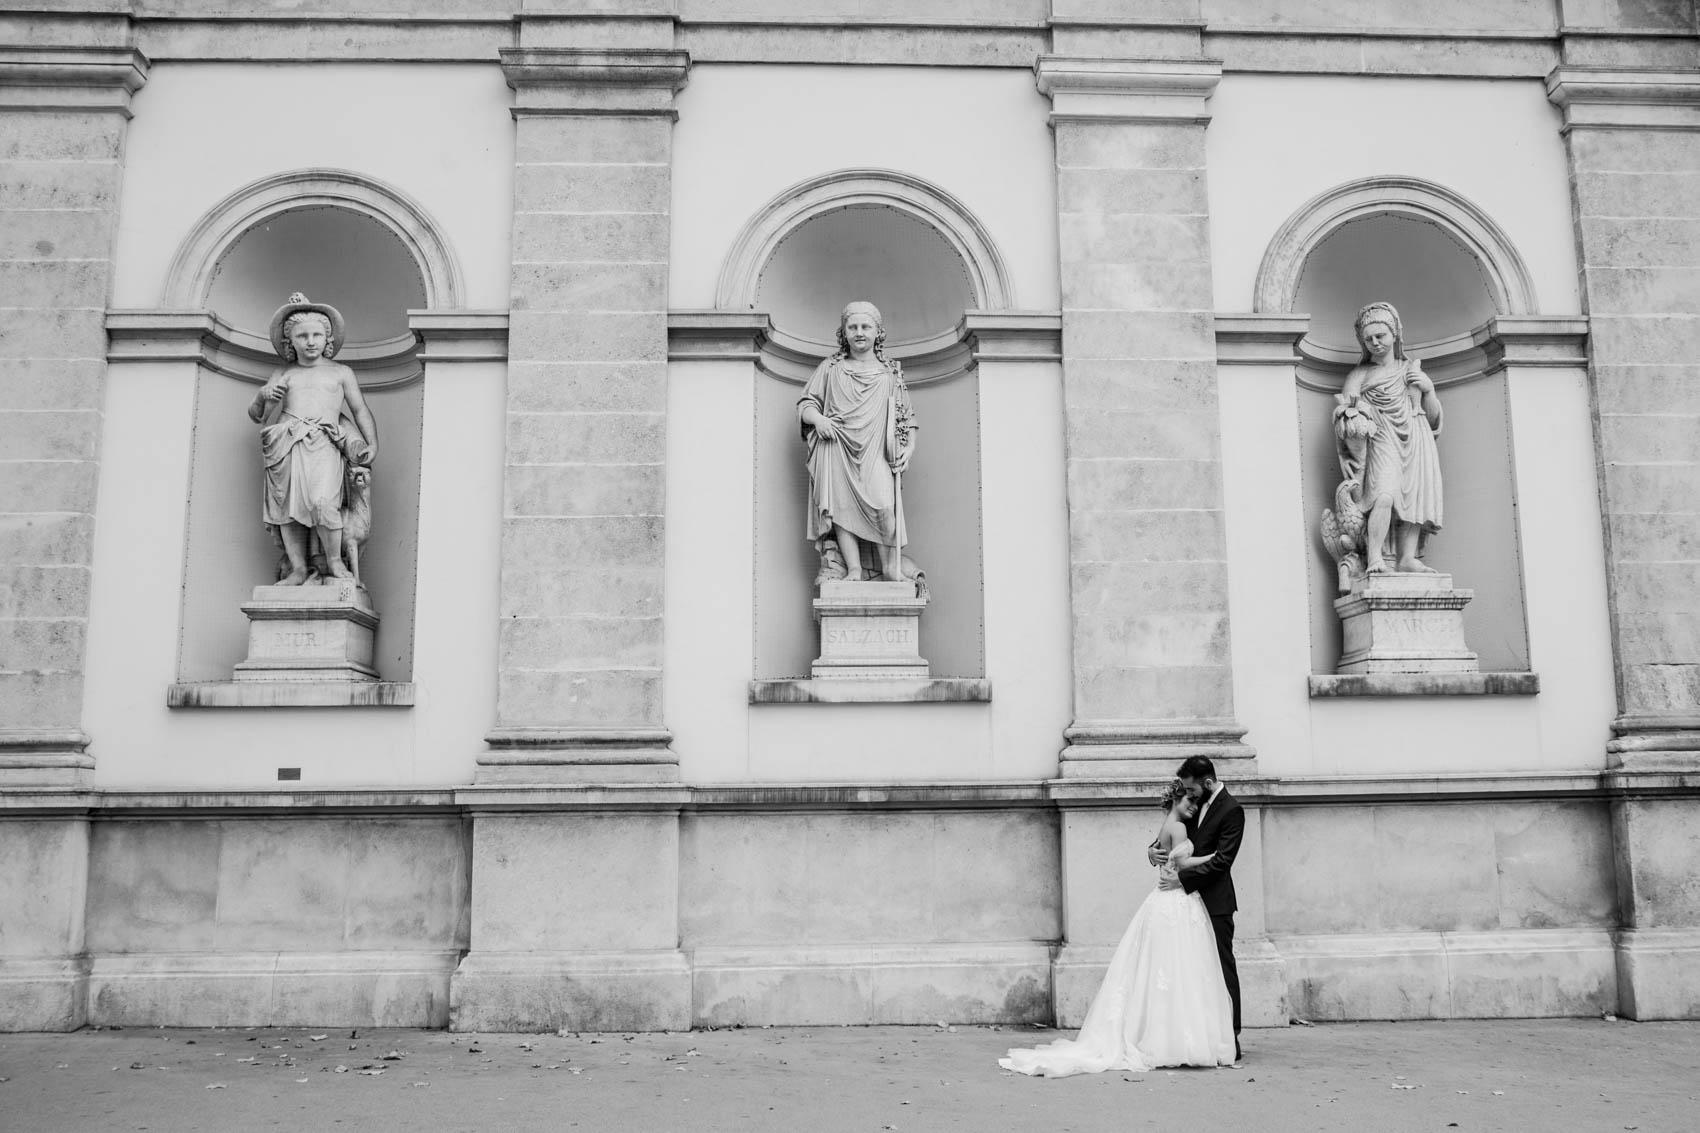 wedding-story-costas-nicky-white-owl-films-3